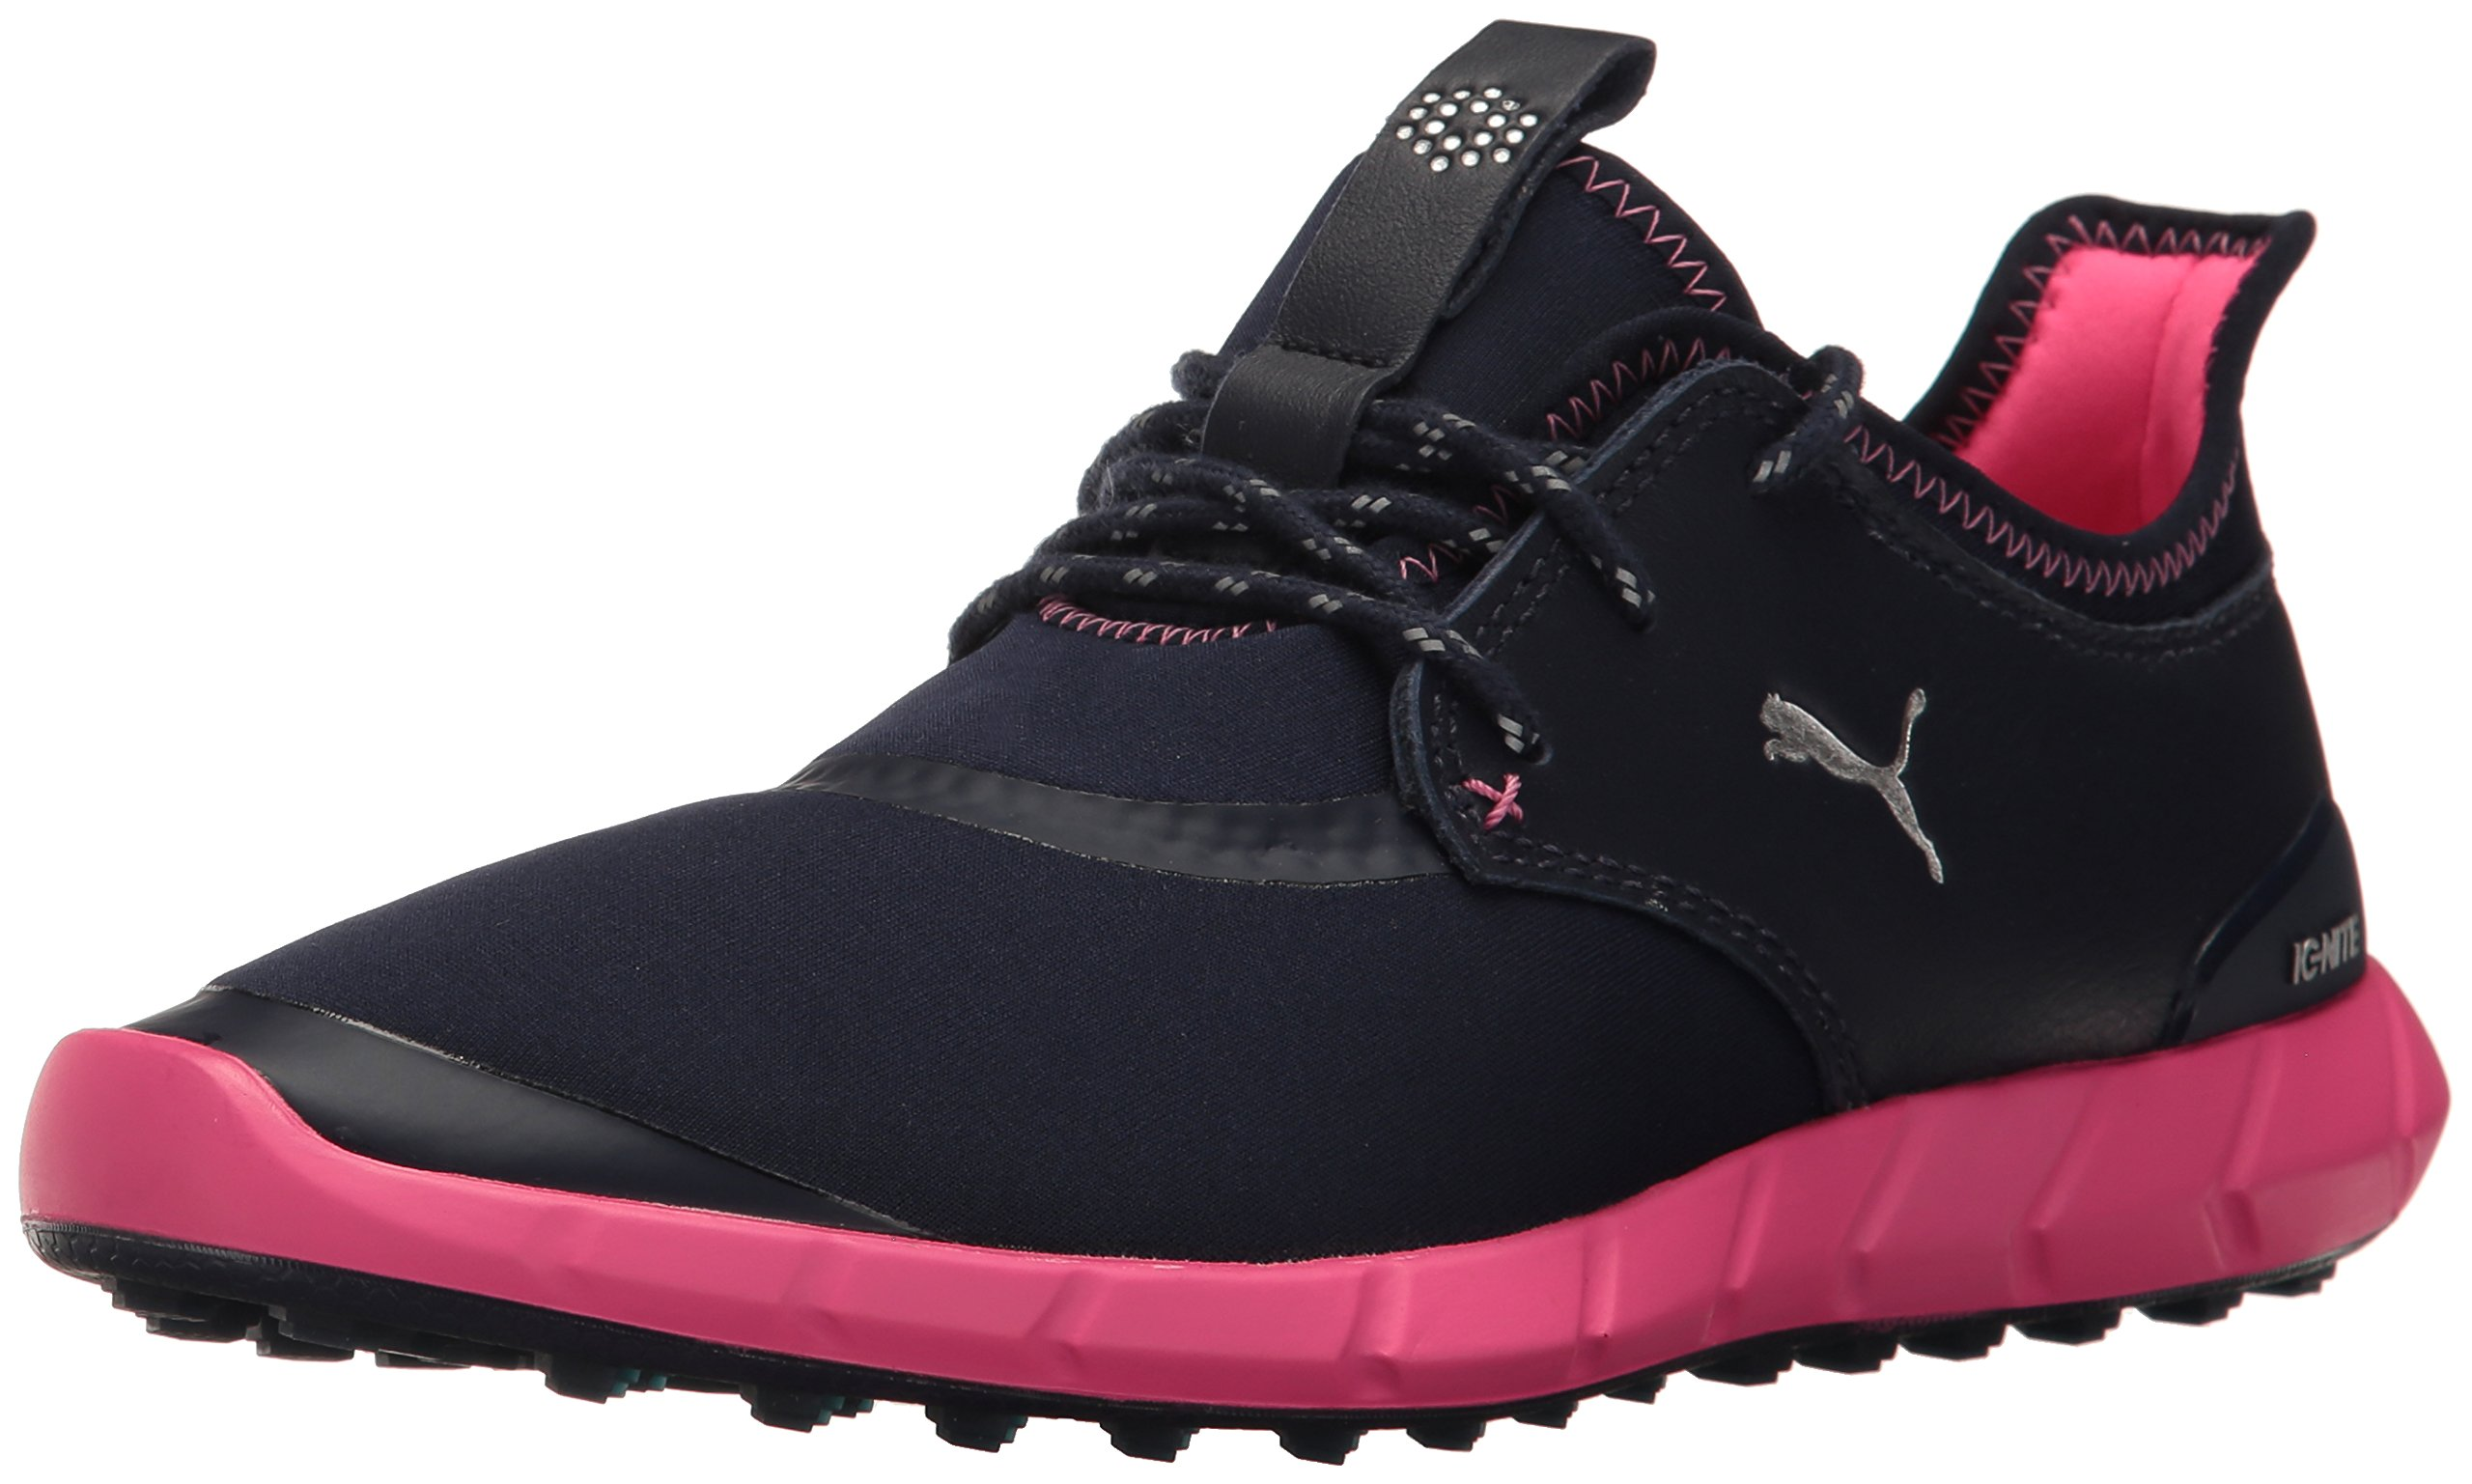 PUMA Women's Ignite Spikeless Sport WMNS Golf Shoe, Peacoat Silver-Knockout Pink, 7.5 Medium US